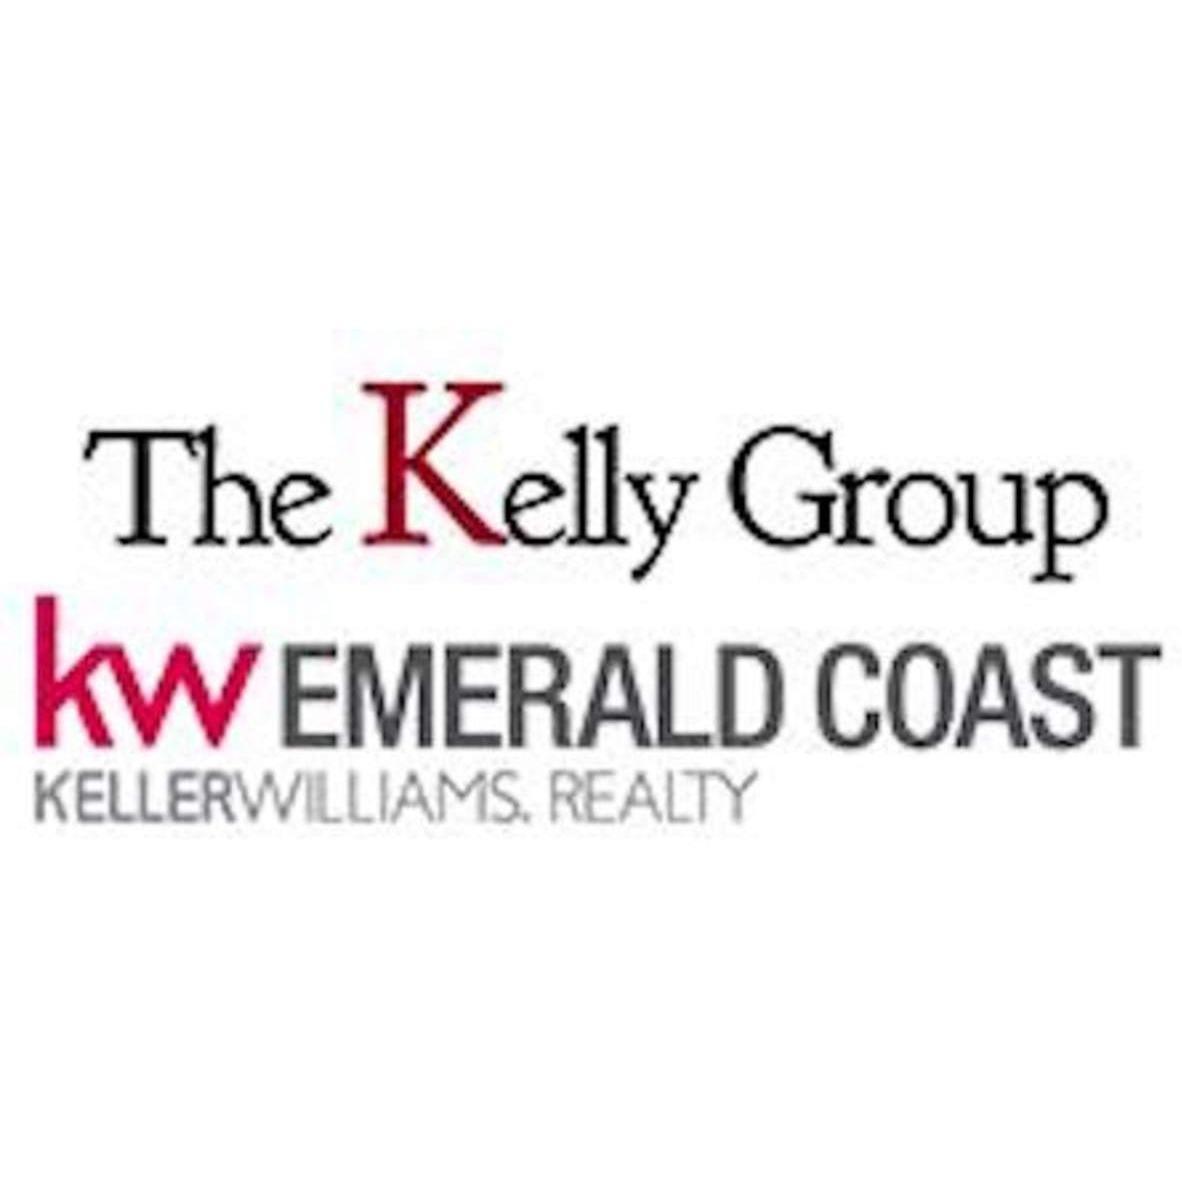 The Destin Kelly Group